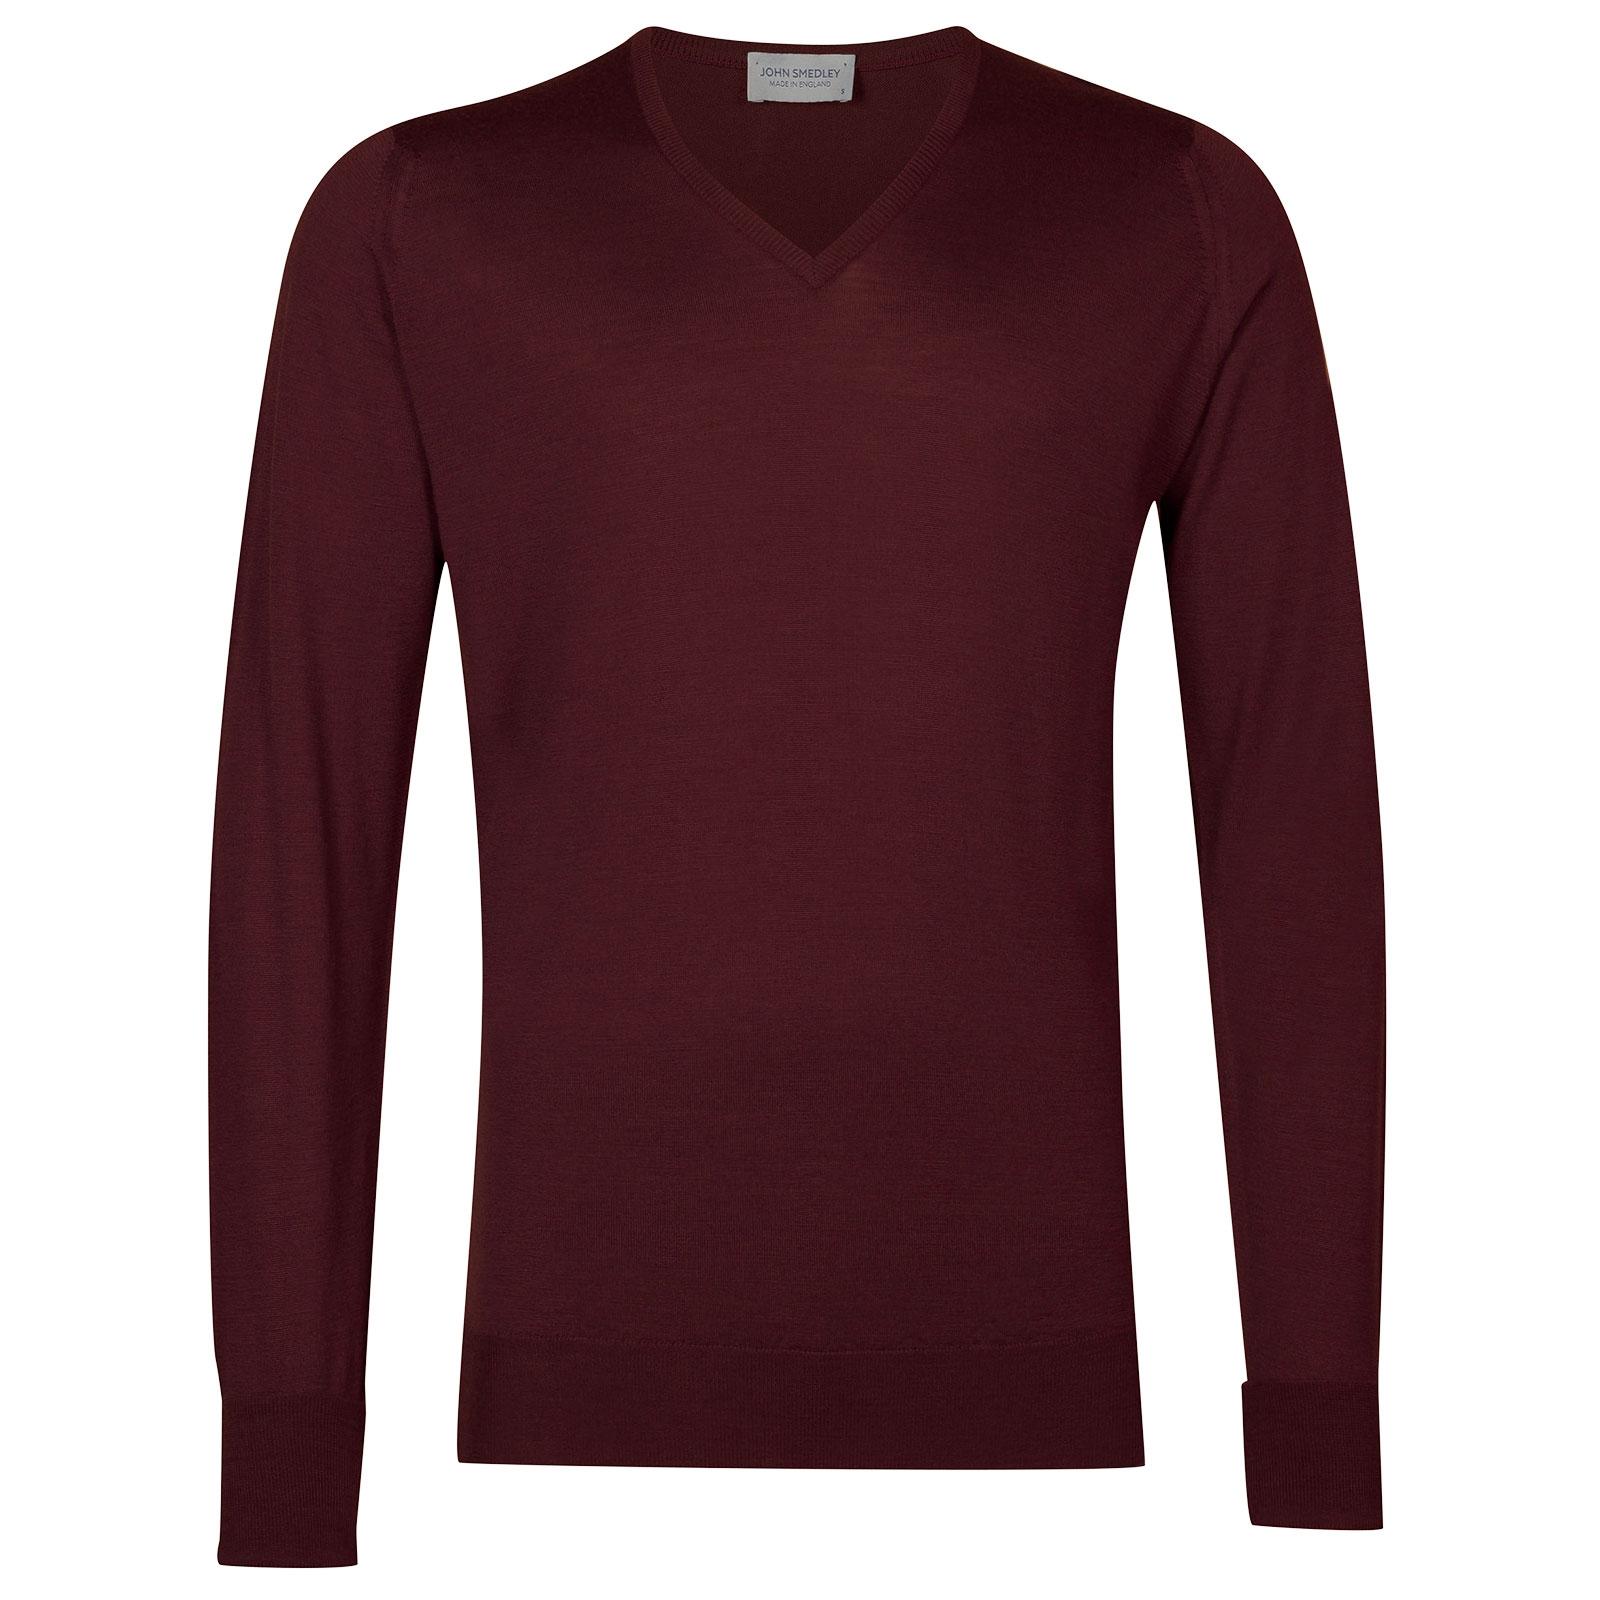 John Smedley Bobby Merino Wool Pullover in Bordeaux-XXL